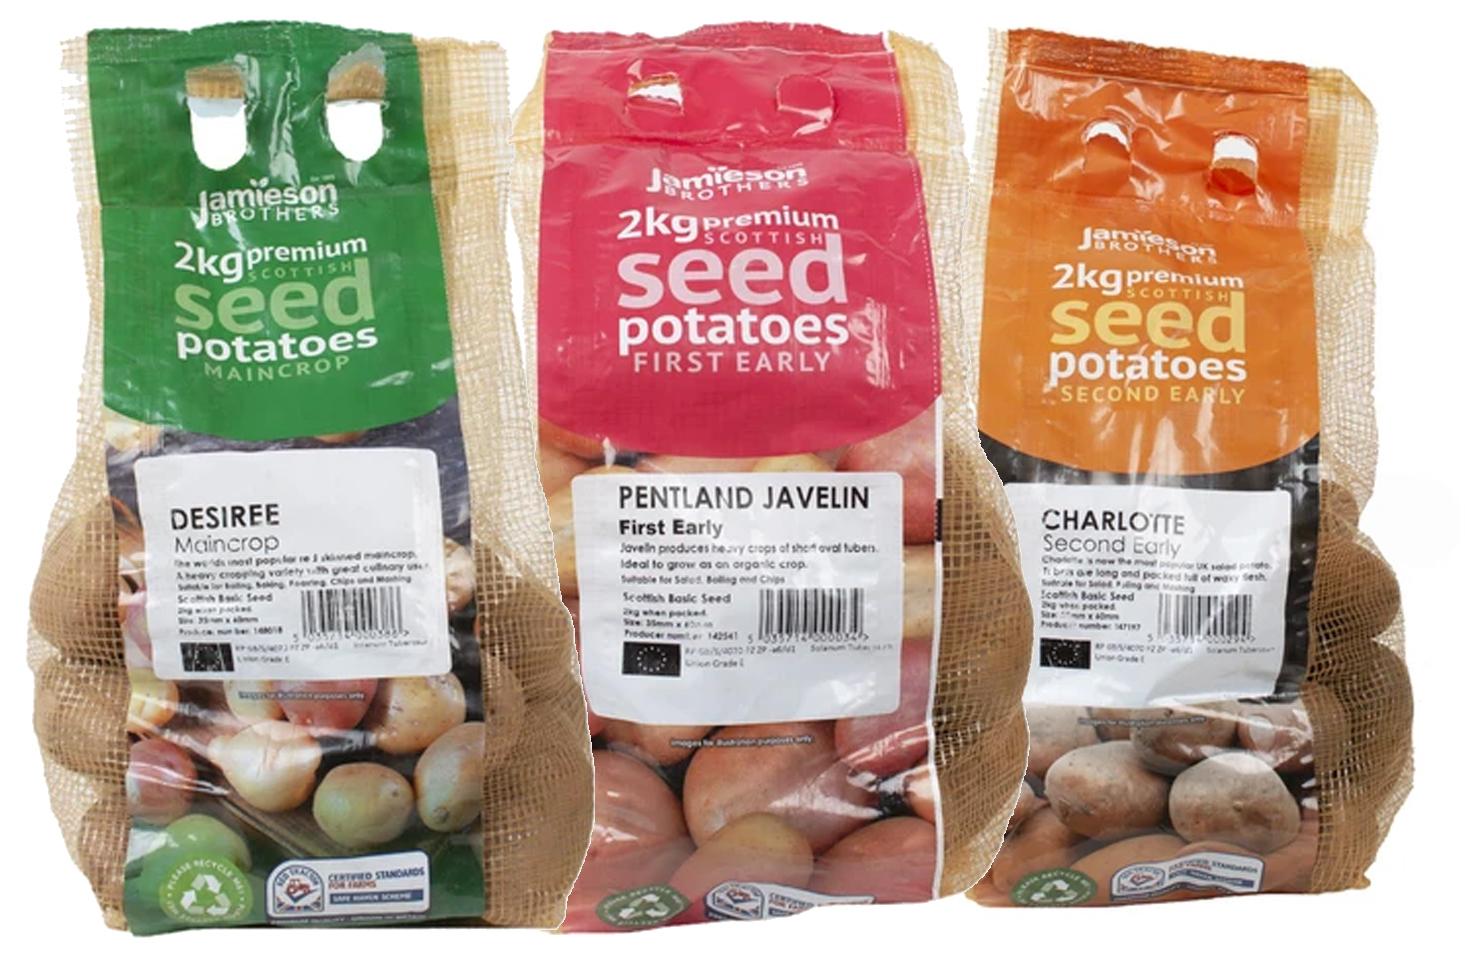 2KG Desiree + 2KG Pentland Javelin + £2KG Charlotte Chitting Potatoes (Other Varieties too) £8.08 with code + delivery @ YorkshireTrading